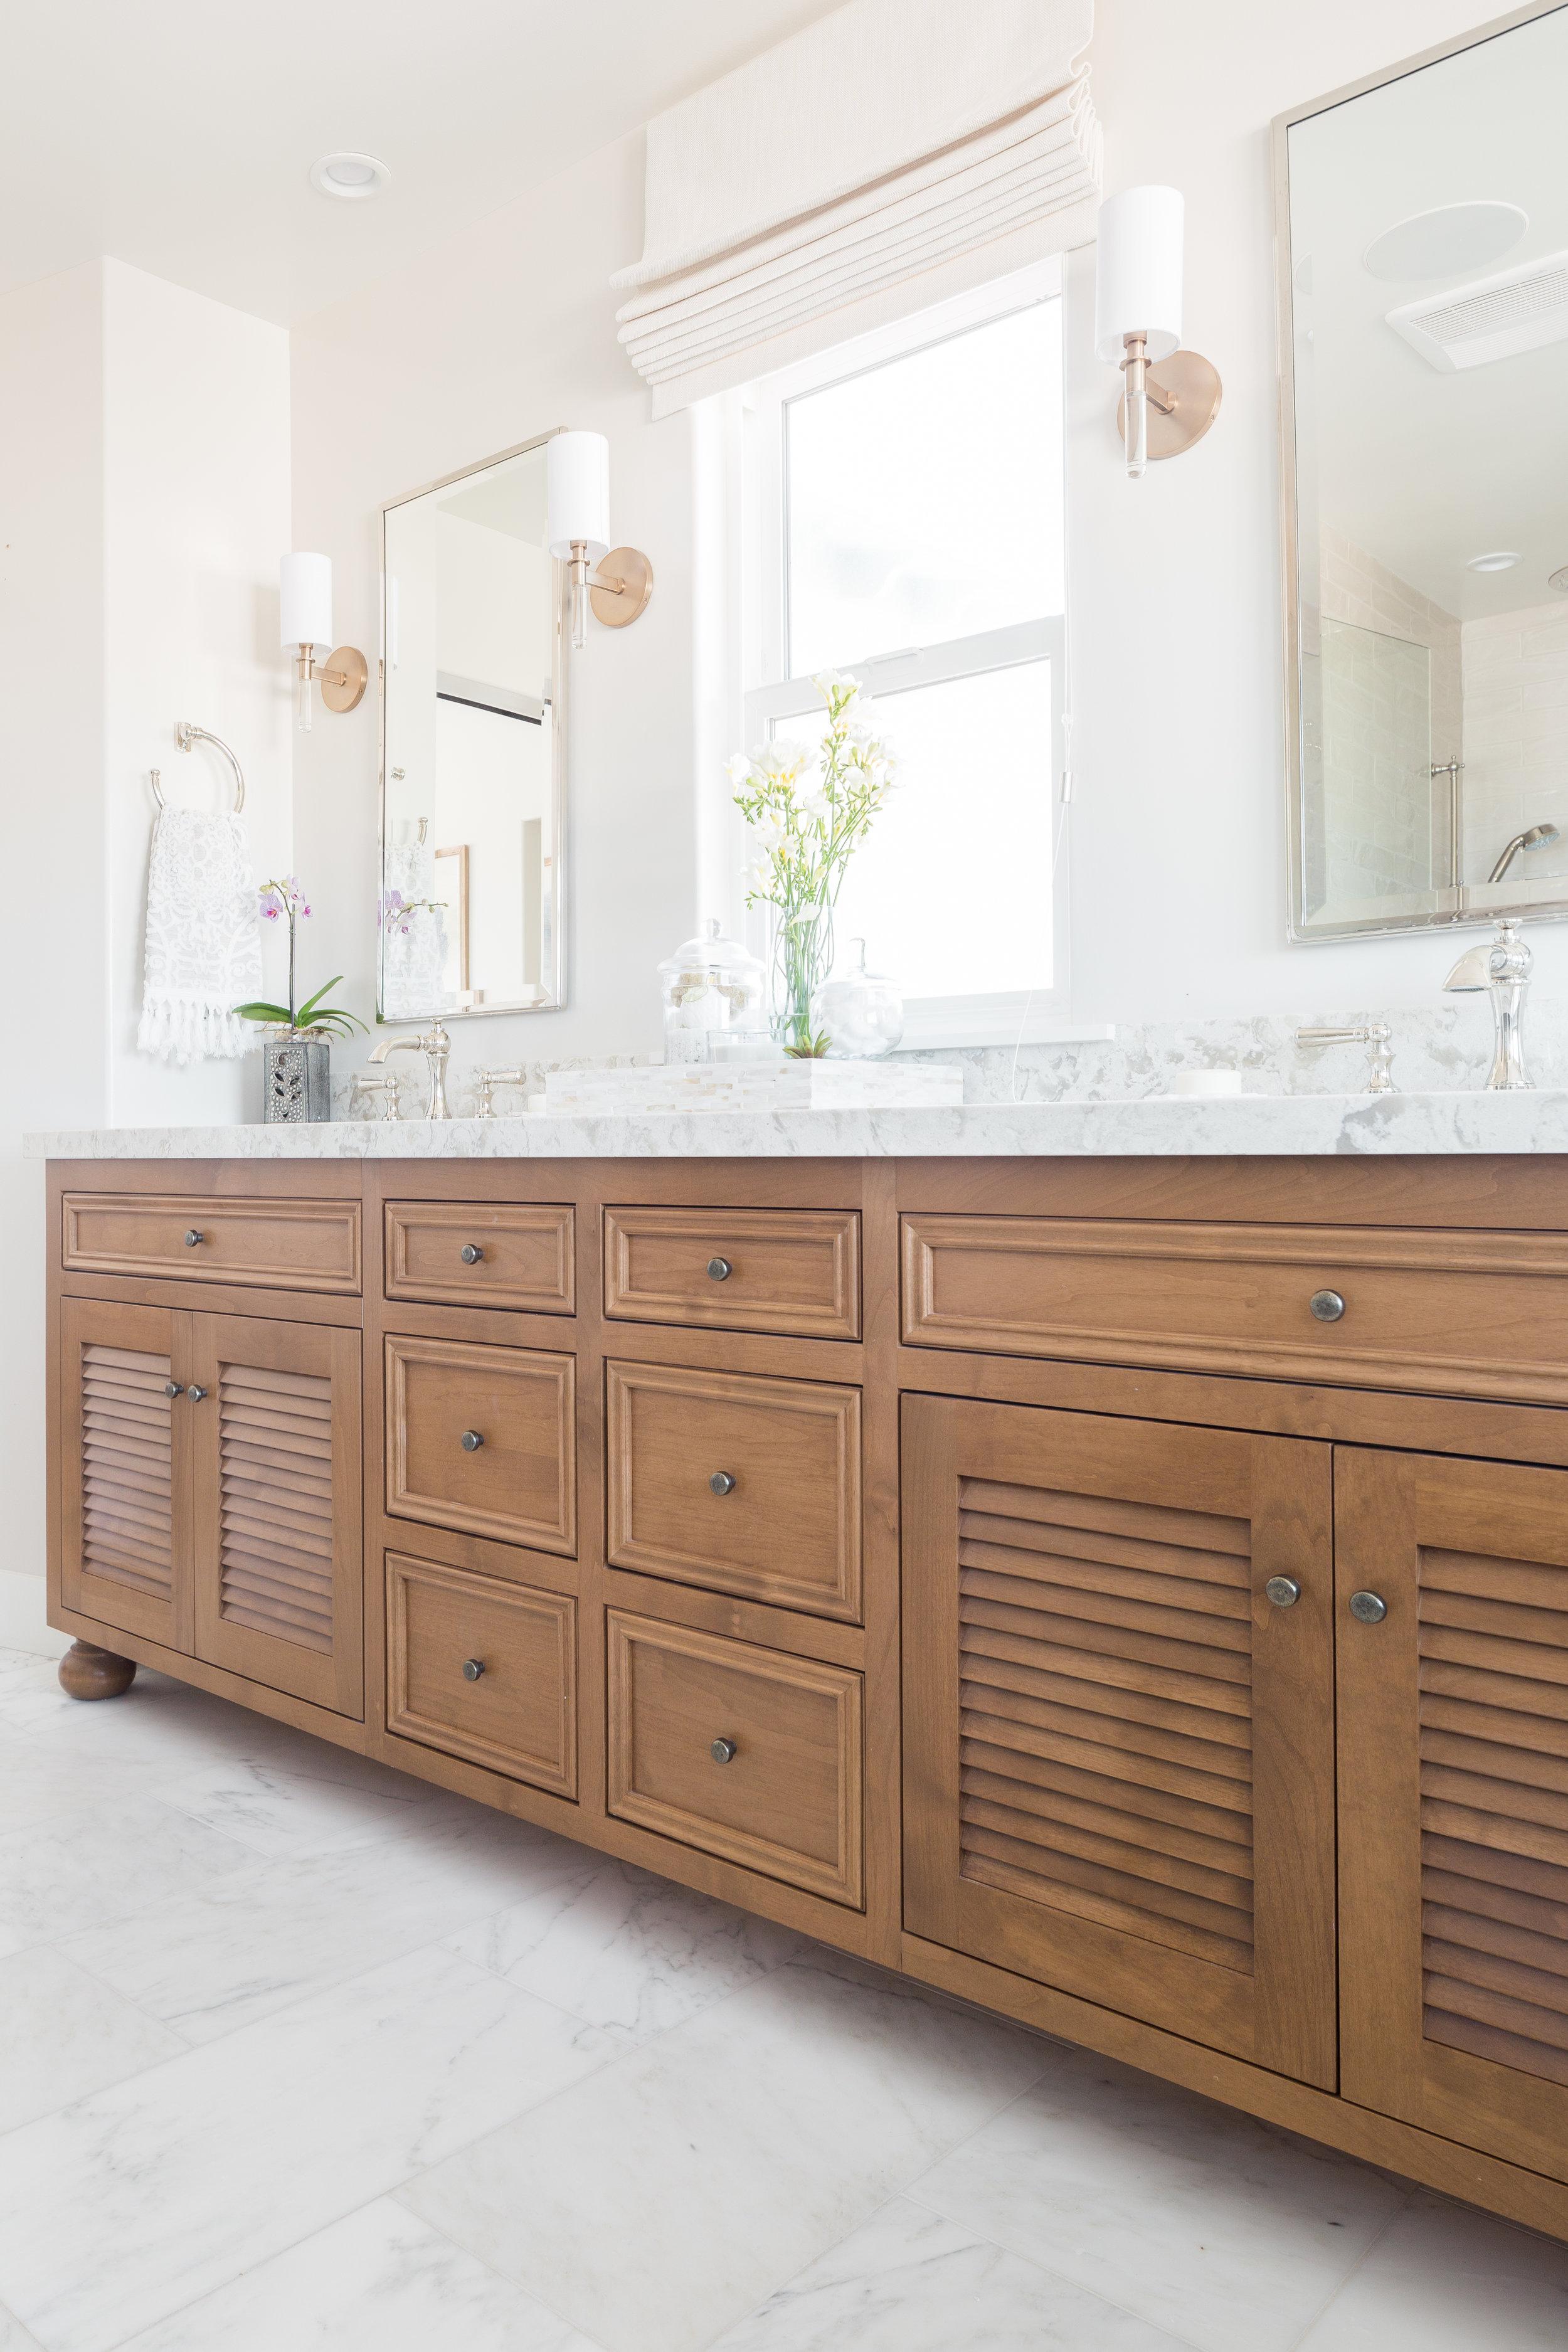 Master Bath Cabinet In Alder With Louvered Doors Native Oak